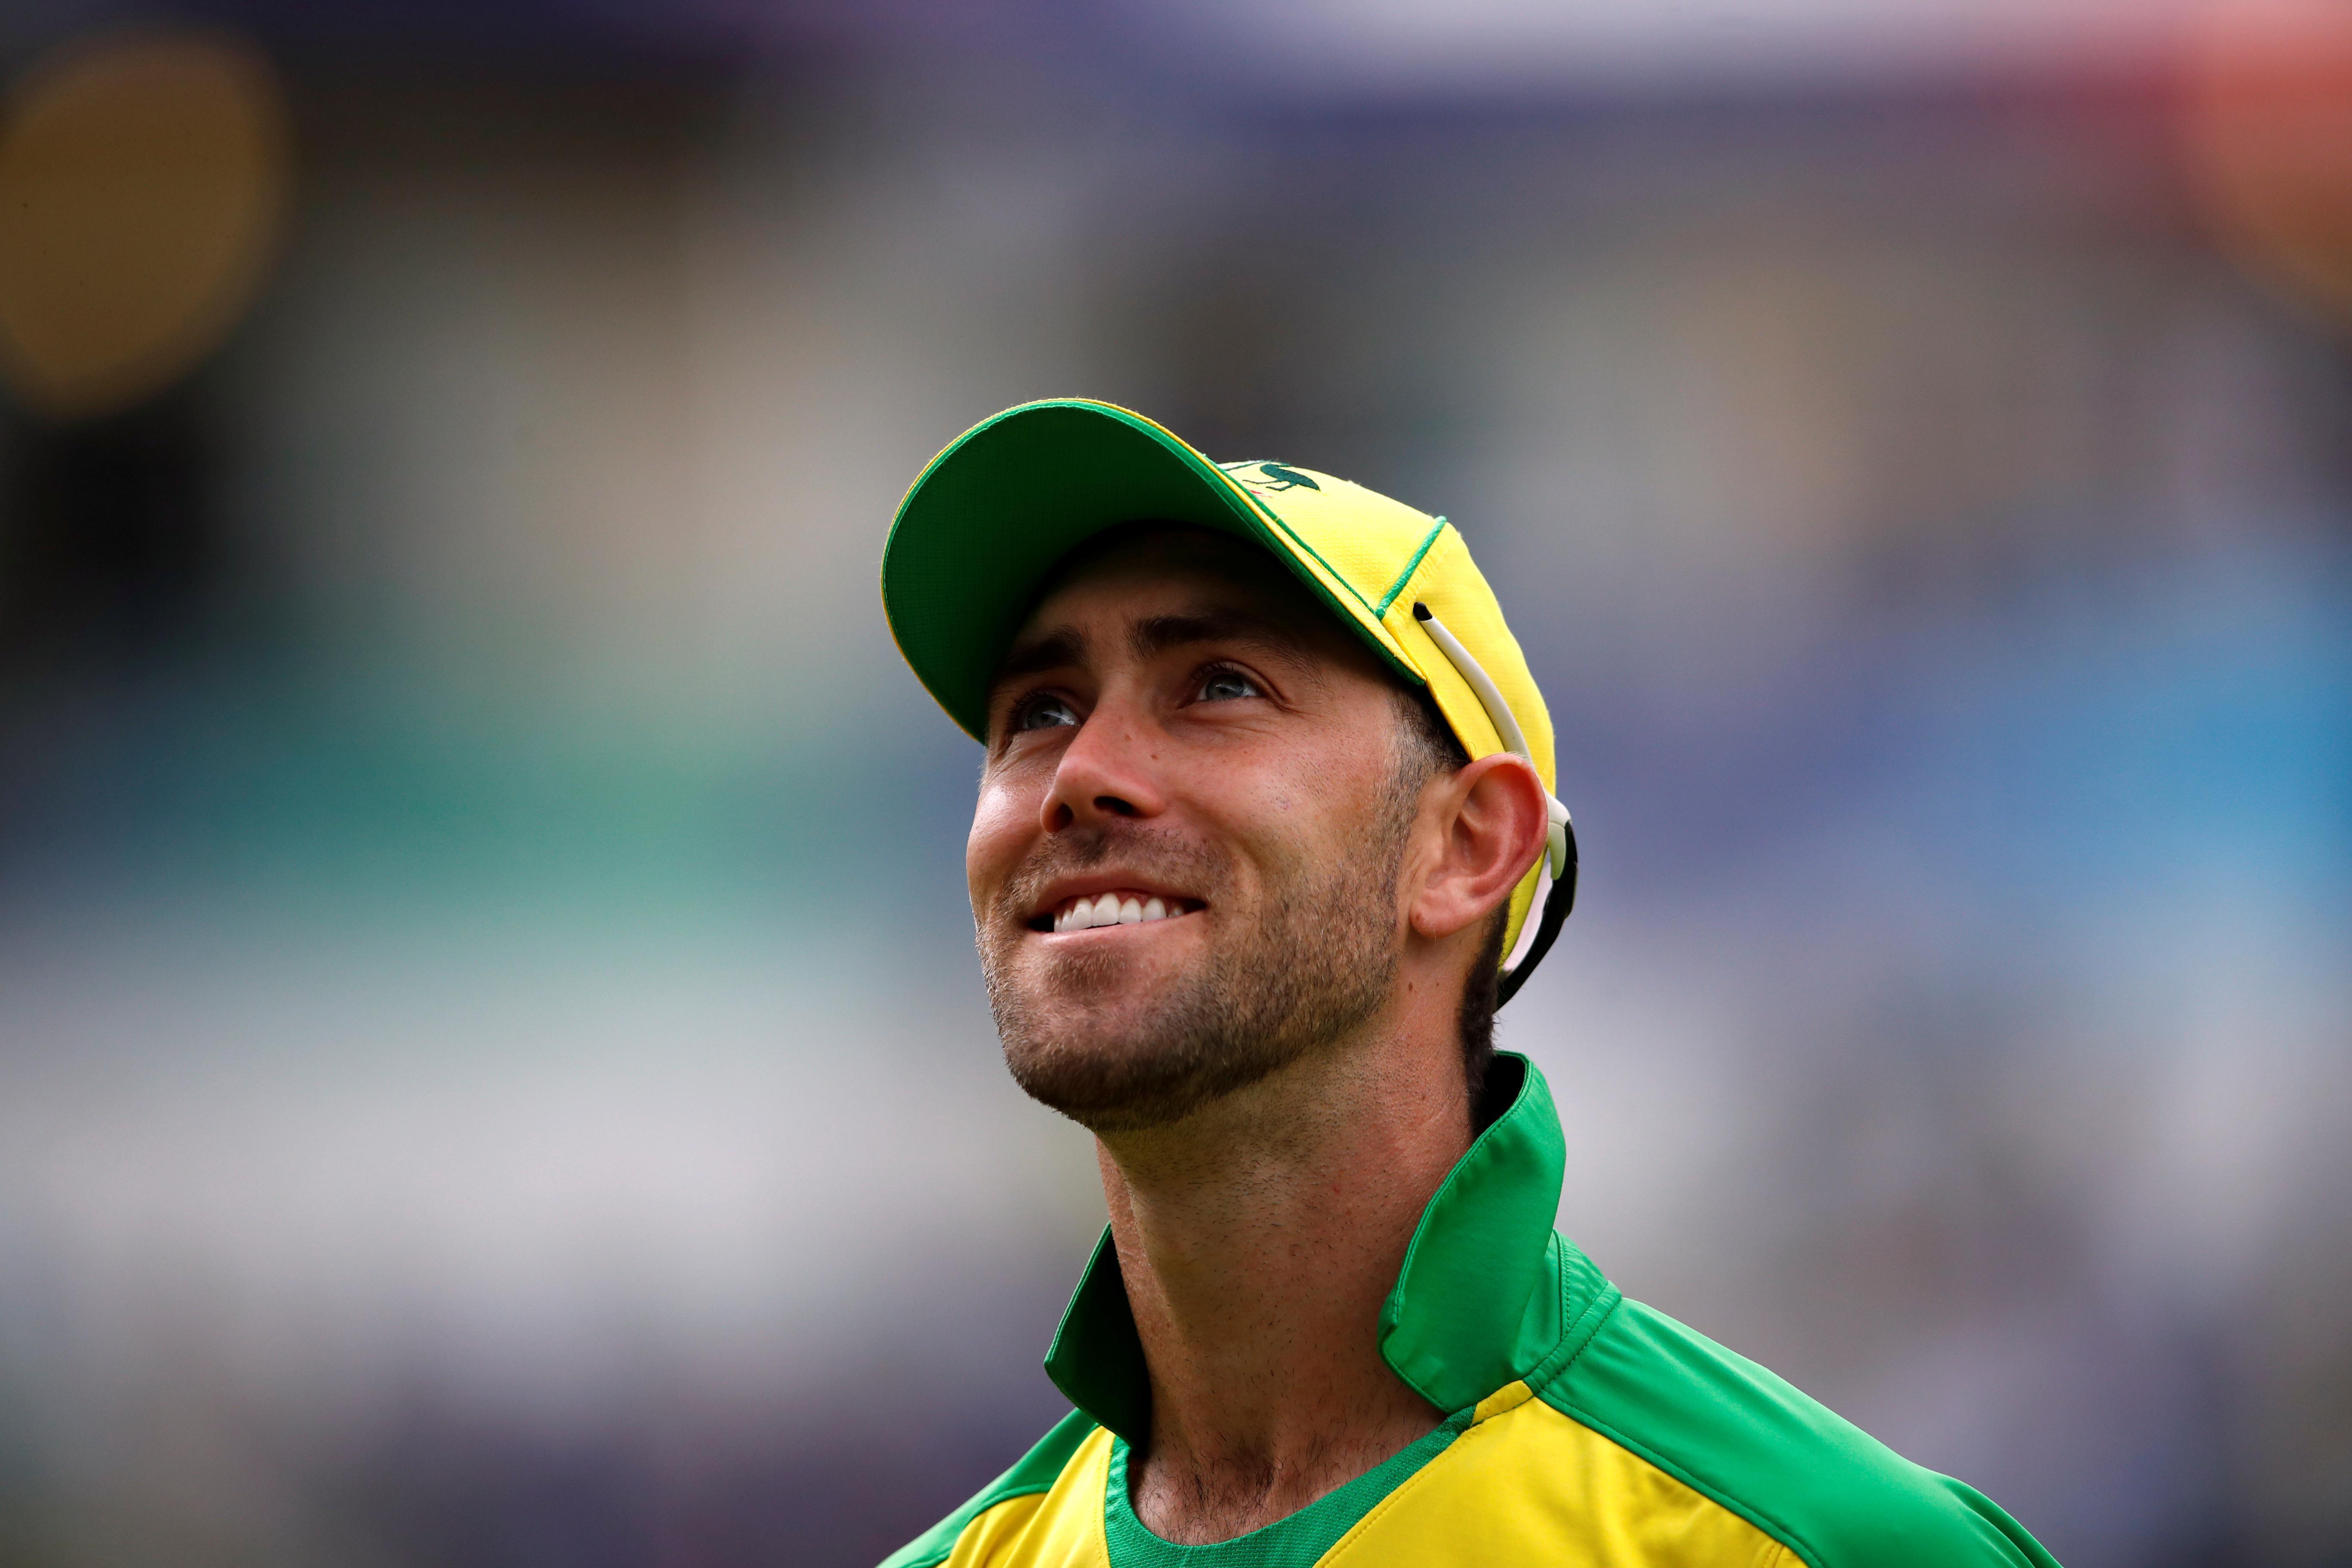 Five Australians in top bracket for IPL auction